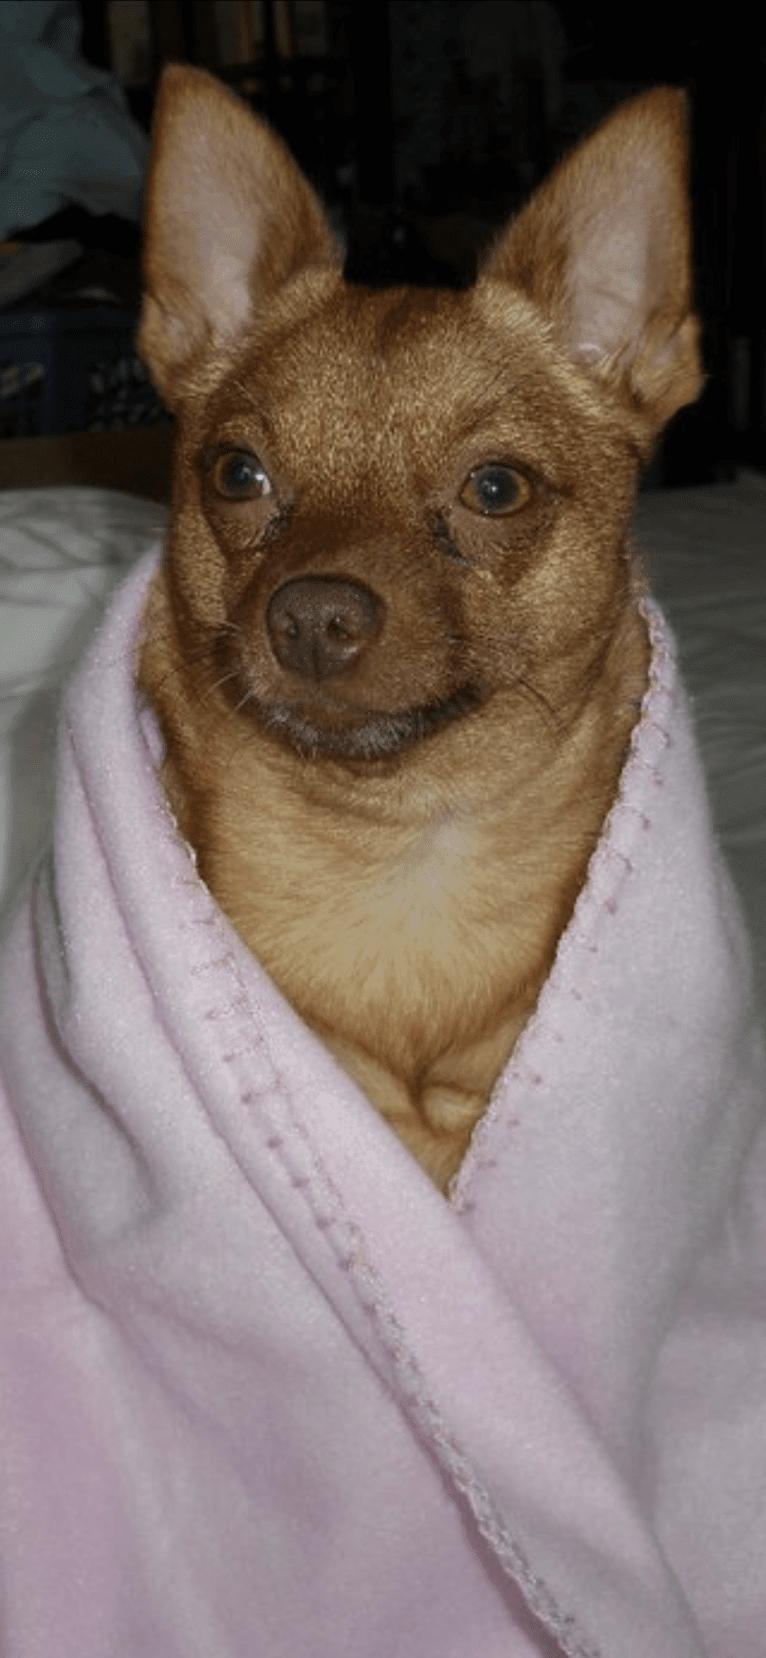 Photo of Rena Grace, a Miniature Pinscher and Pomeranian mix in Pineville, Louisiana, USA